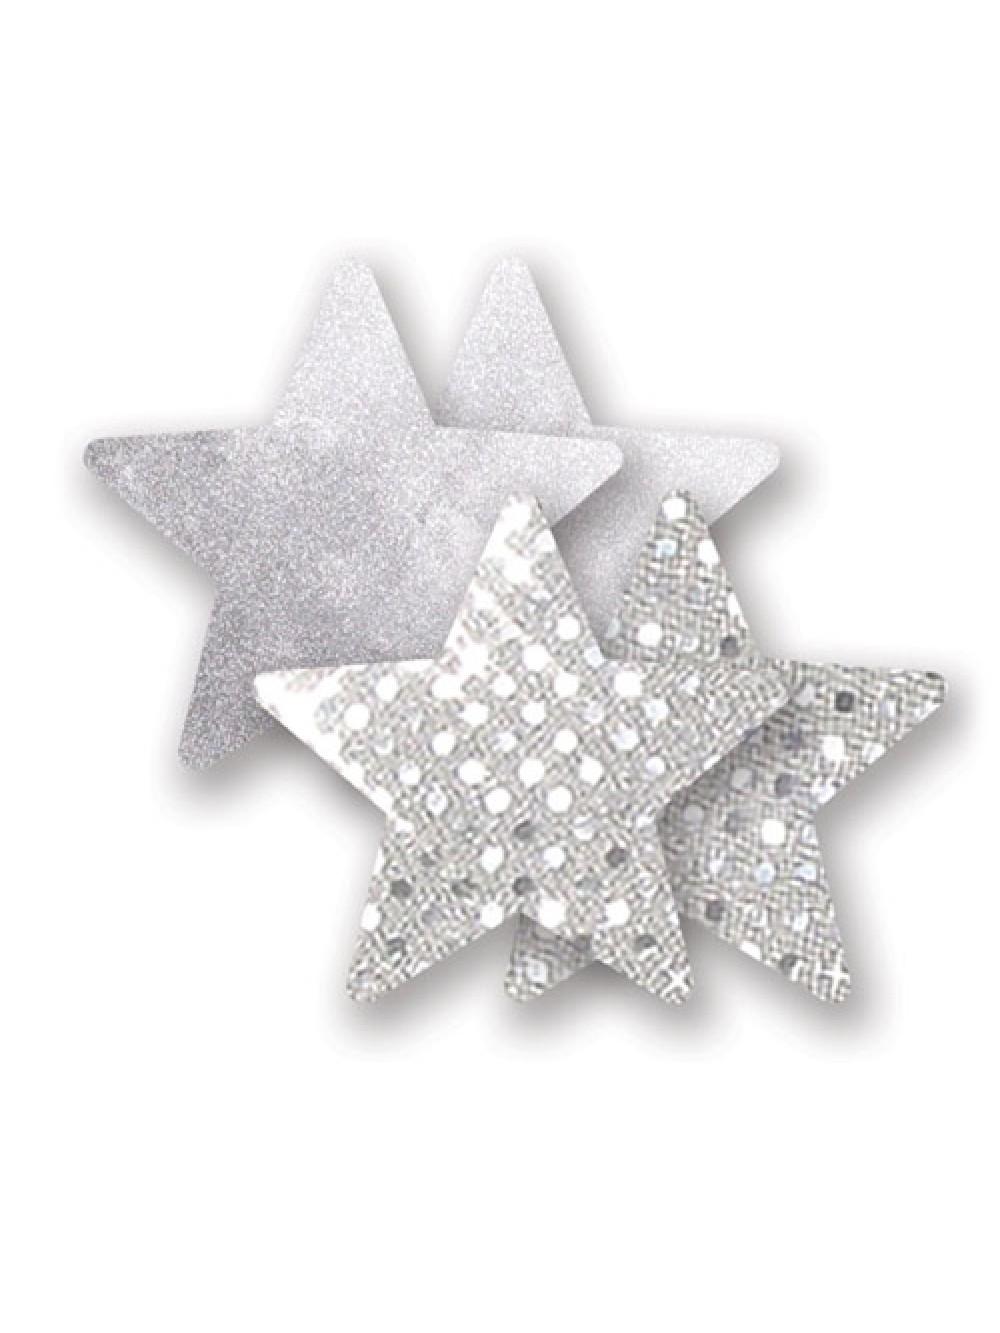 Nippies Pasties - Studio Silver Star 876651001211